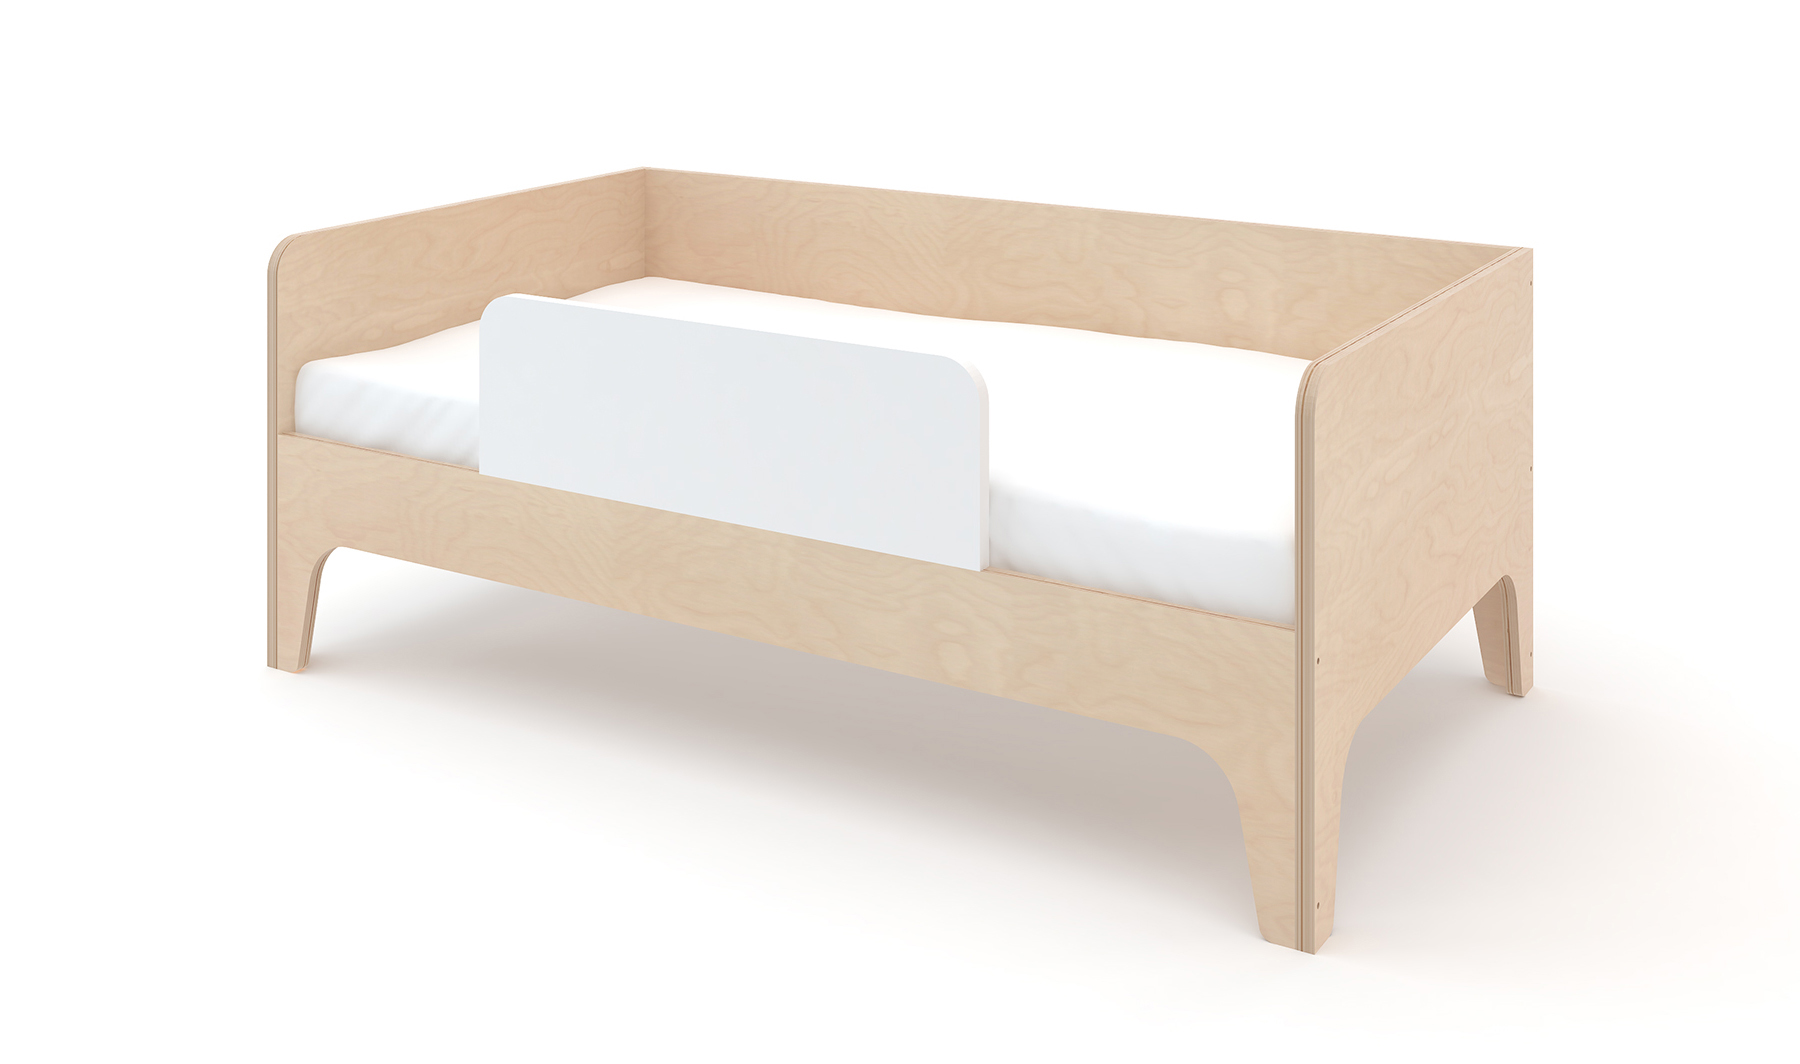 Perch toddler bed , £376, Bobby Rabbit (143.6cm x 73.6cm)